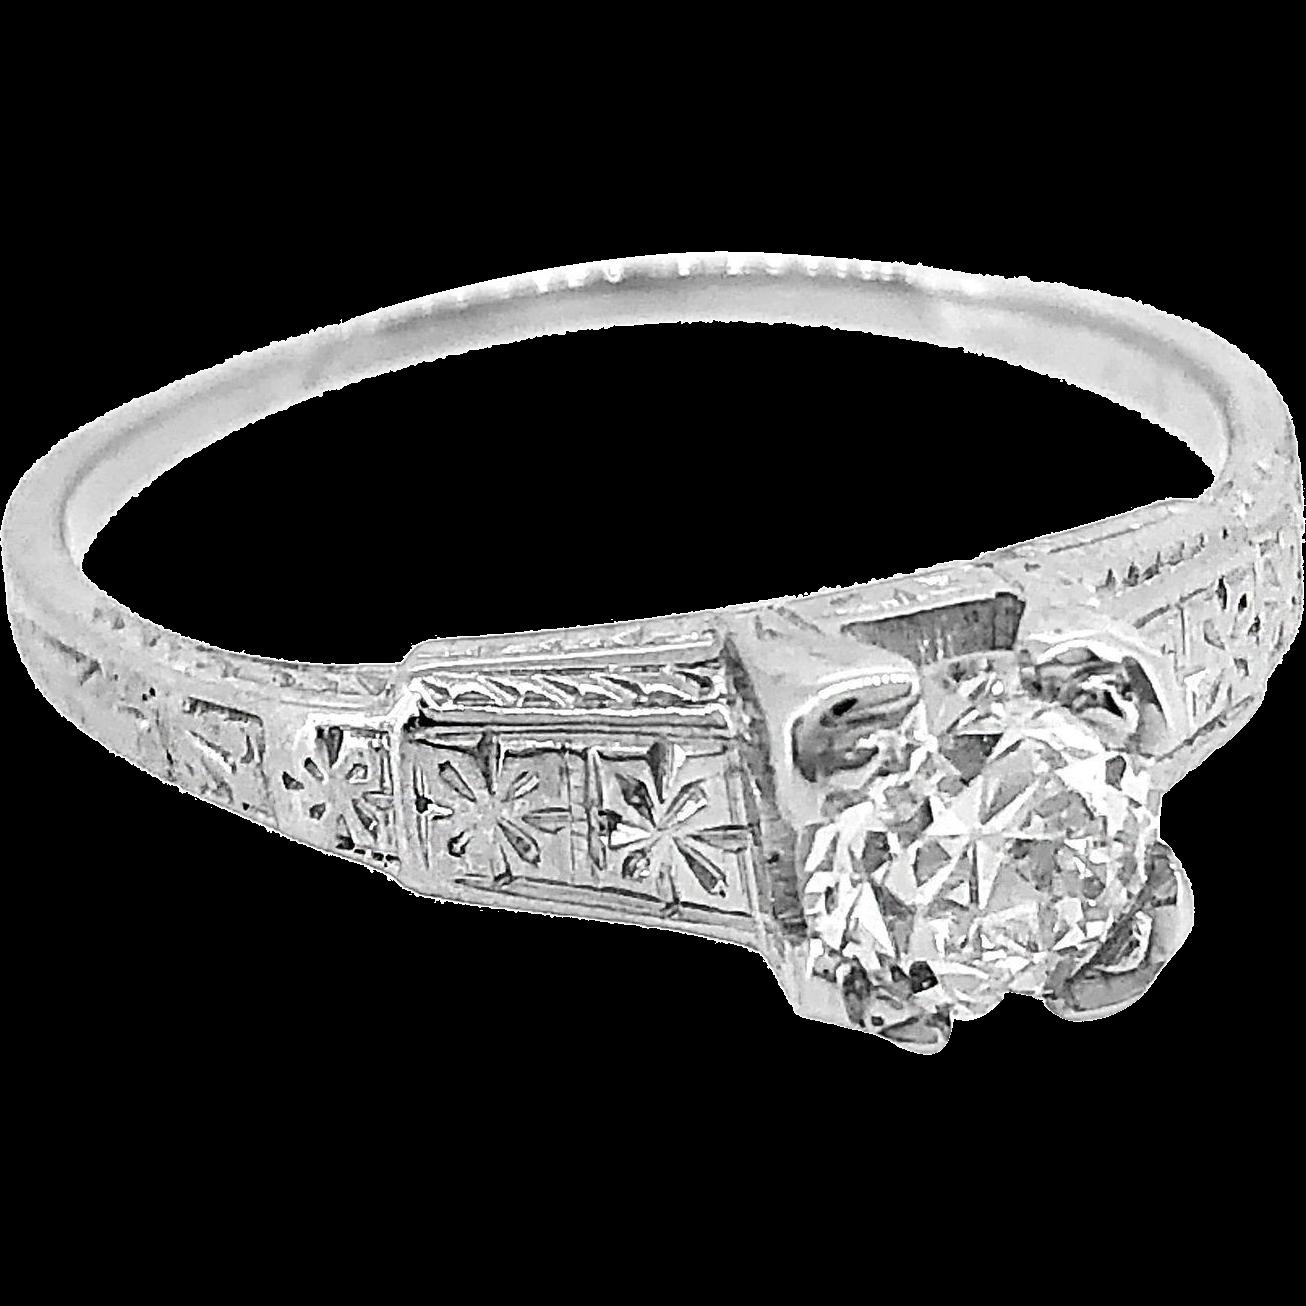 Antique Engagement Ring .55ct. Diamond & 18K White Gold - J35059